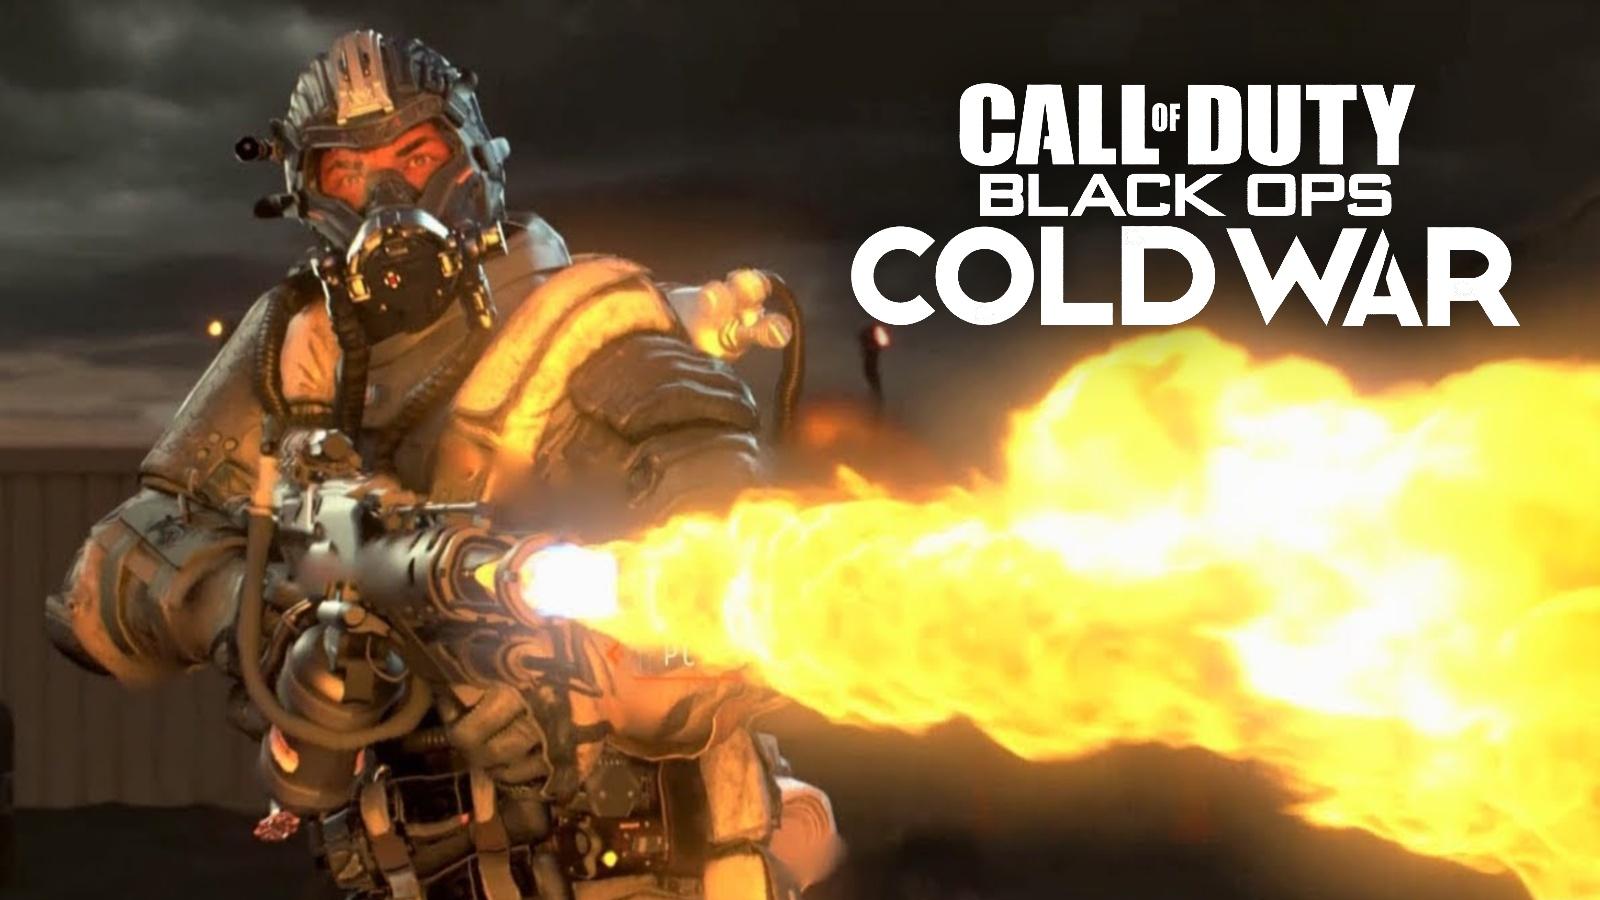 Black Ops flamethrower Cold War